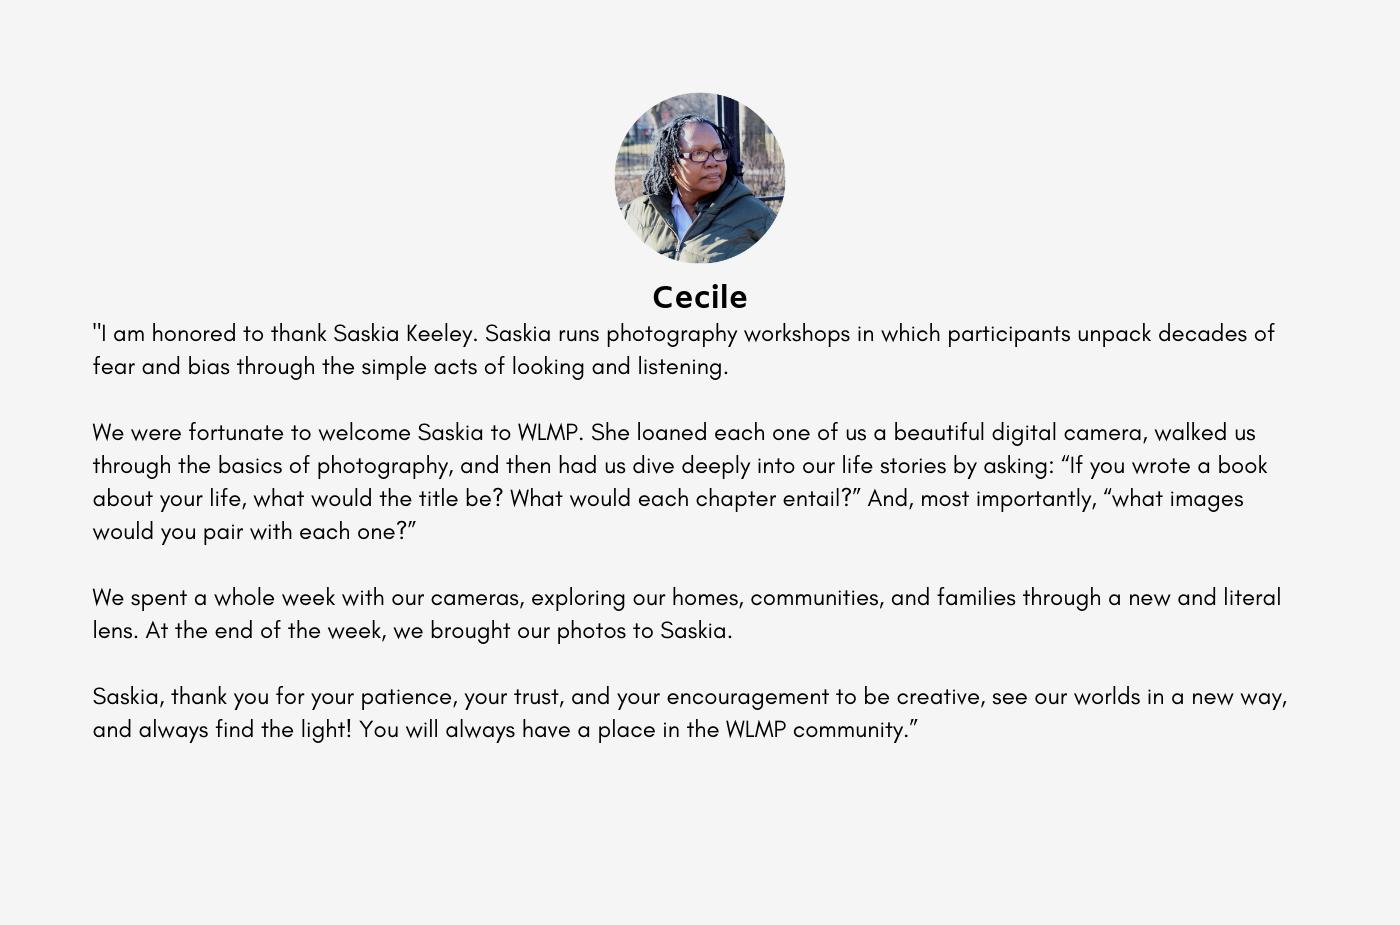 saskia-keeley-photography-humanitarian-photojournalism-documentarian-women-prison-association-accompagnateur-workshop-cecile-testimonial.png